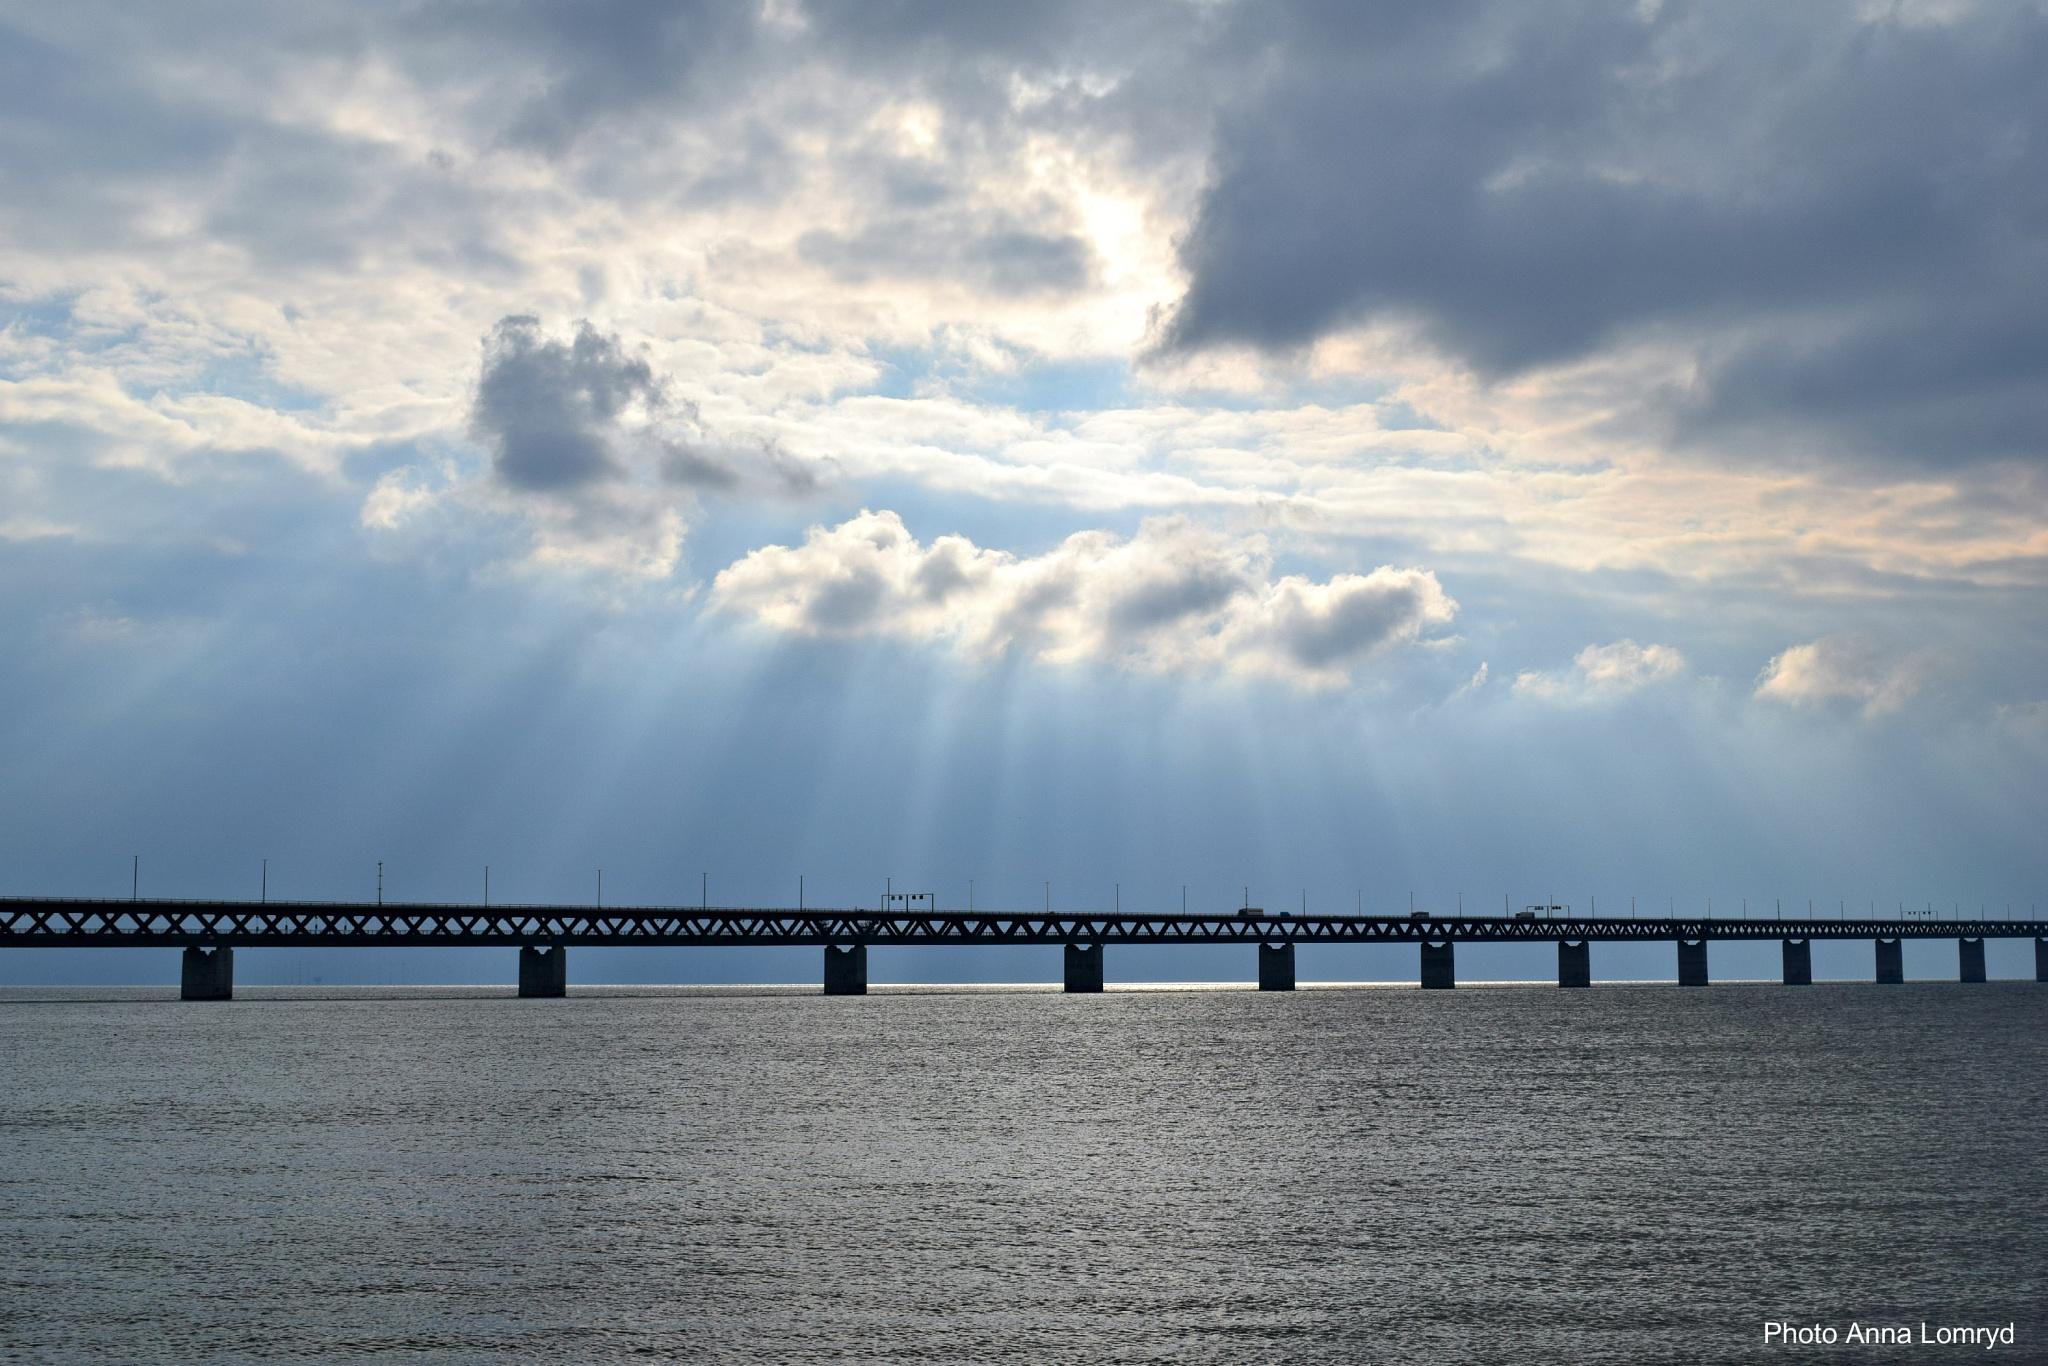 Bridge between Denmark and Sweden by Anna Lomryd